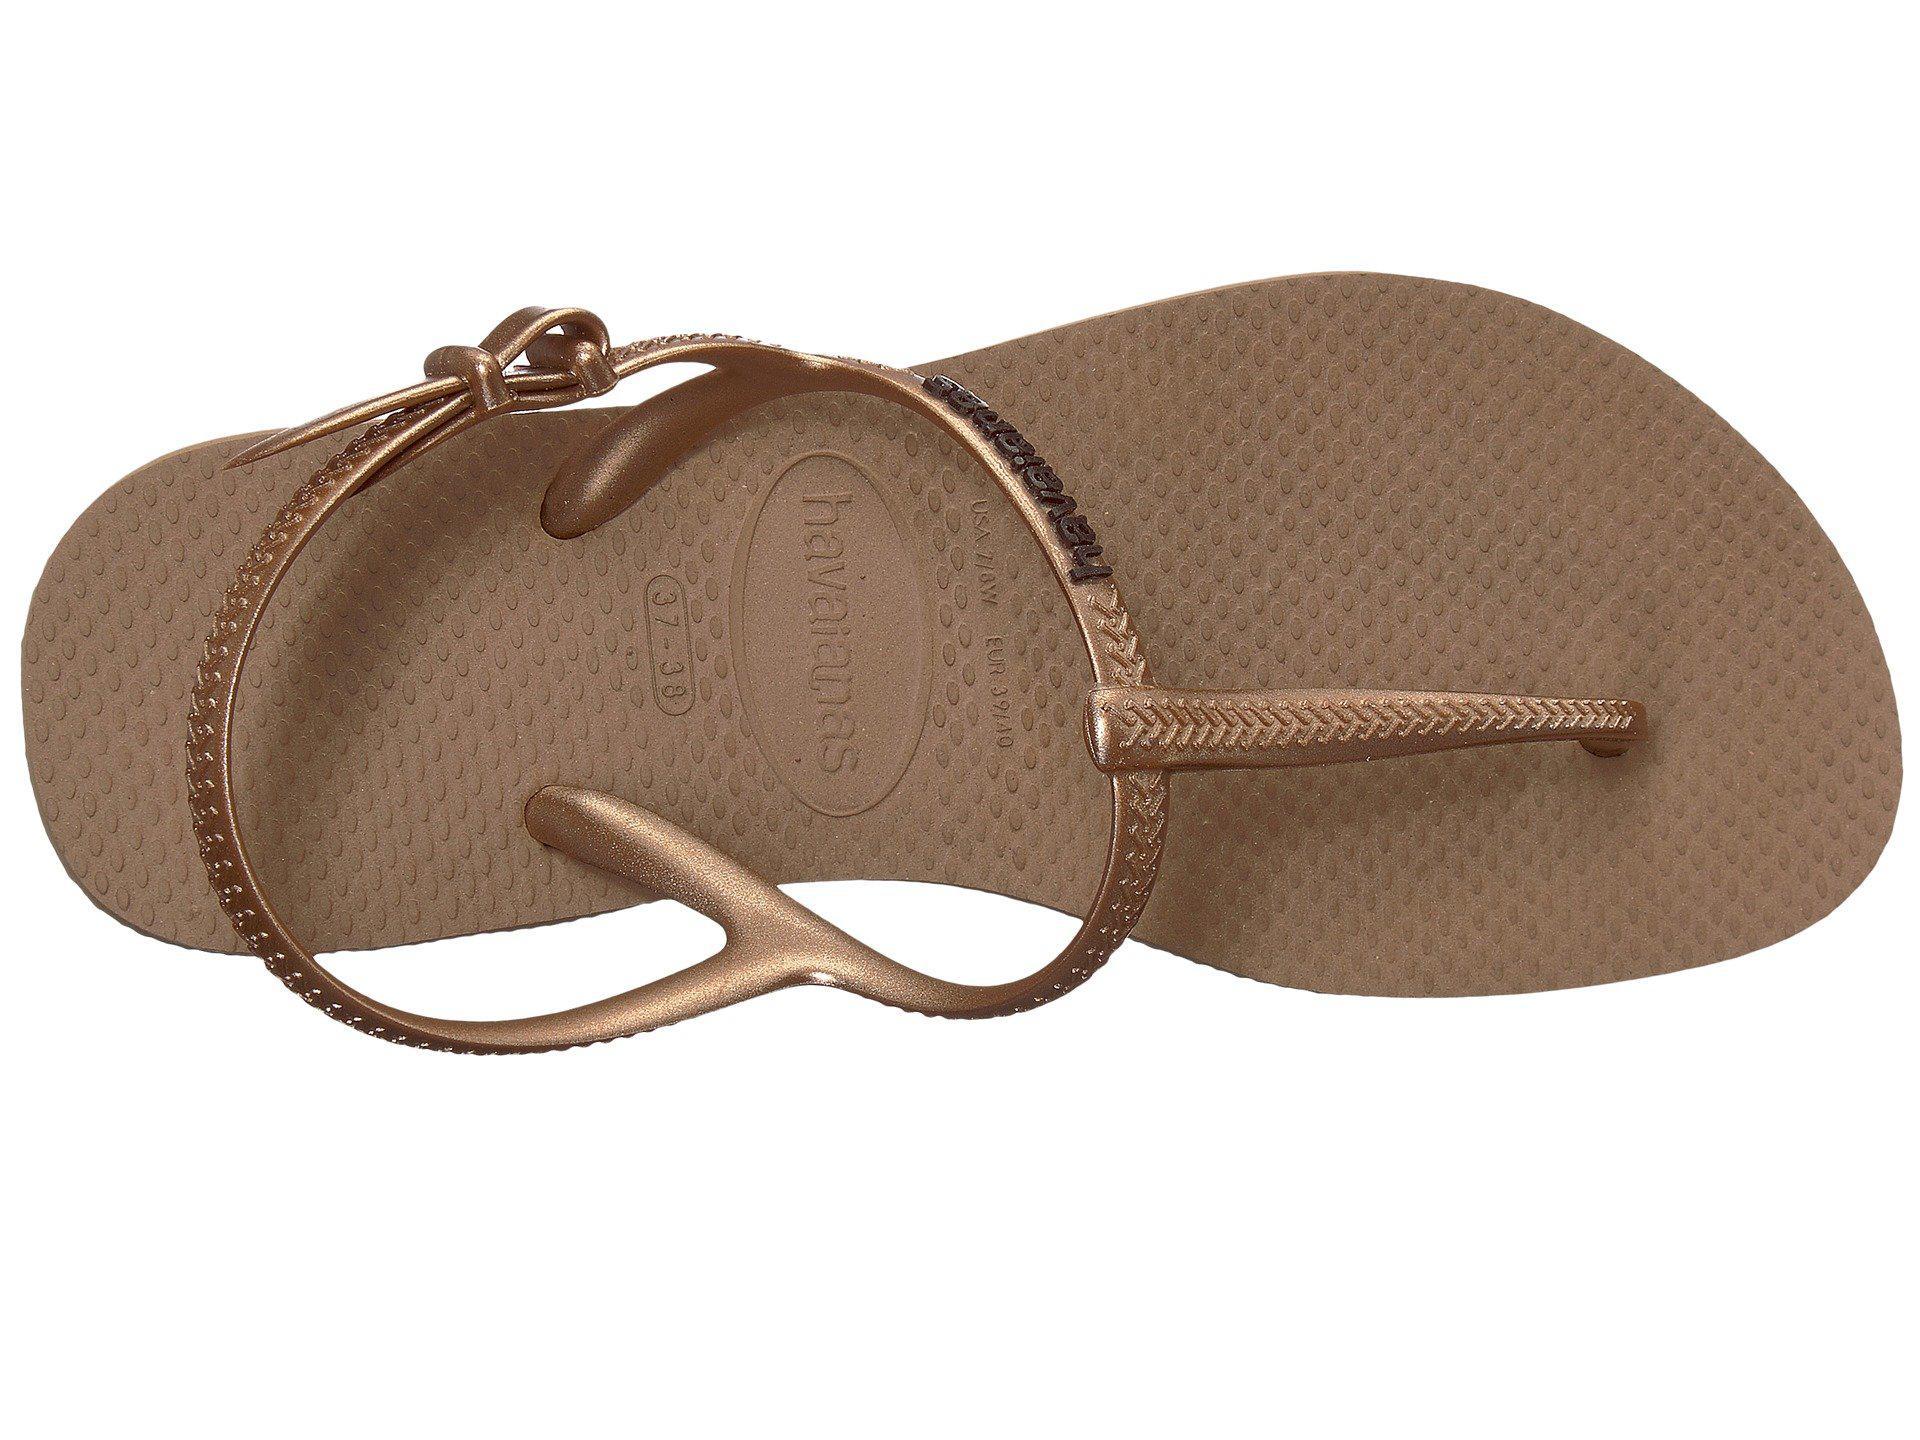 ad4ea406b34f Lyst - Havaianas Freedom Sl Flip-flops (rose Gold) Women s Sandals